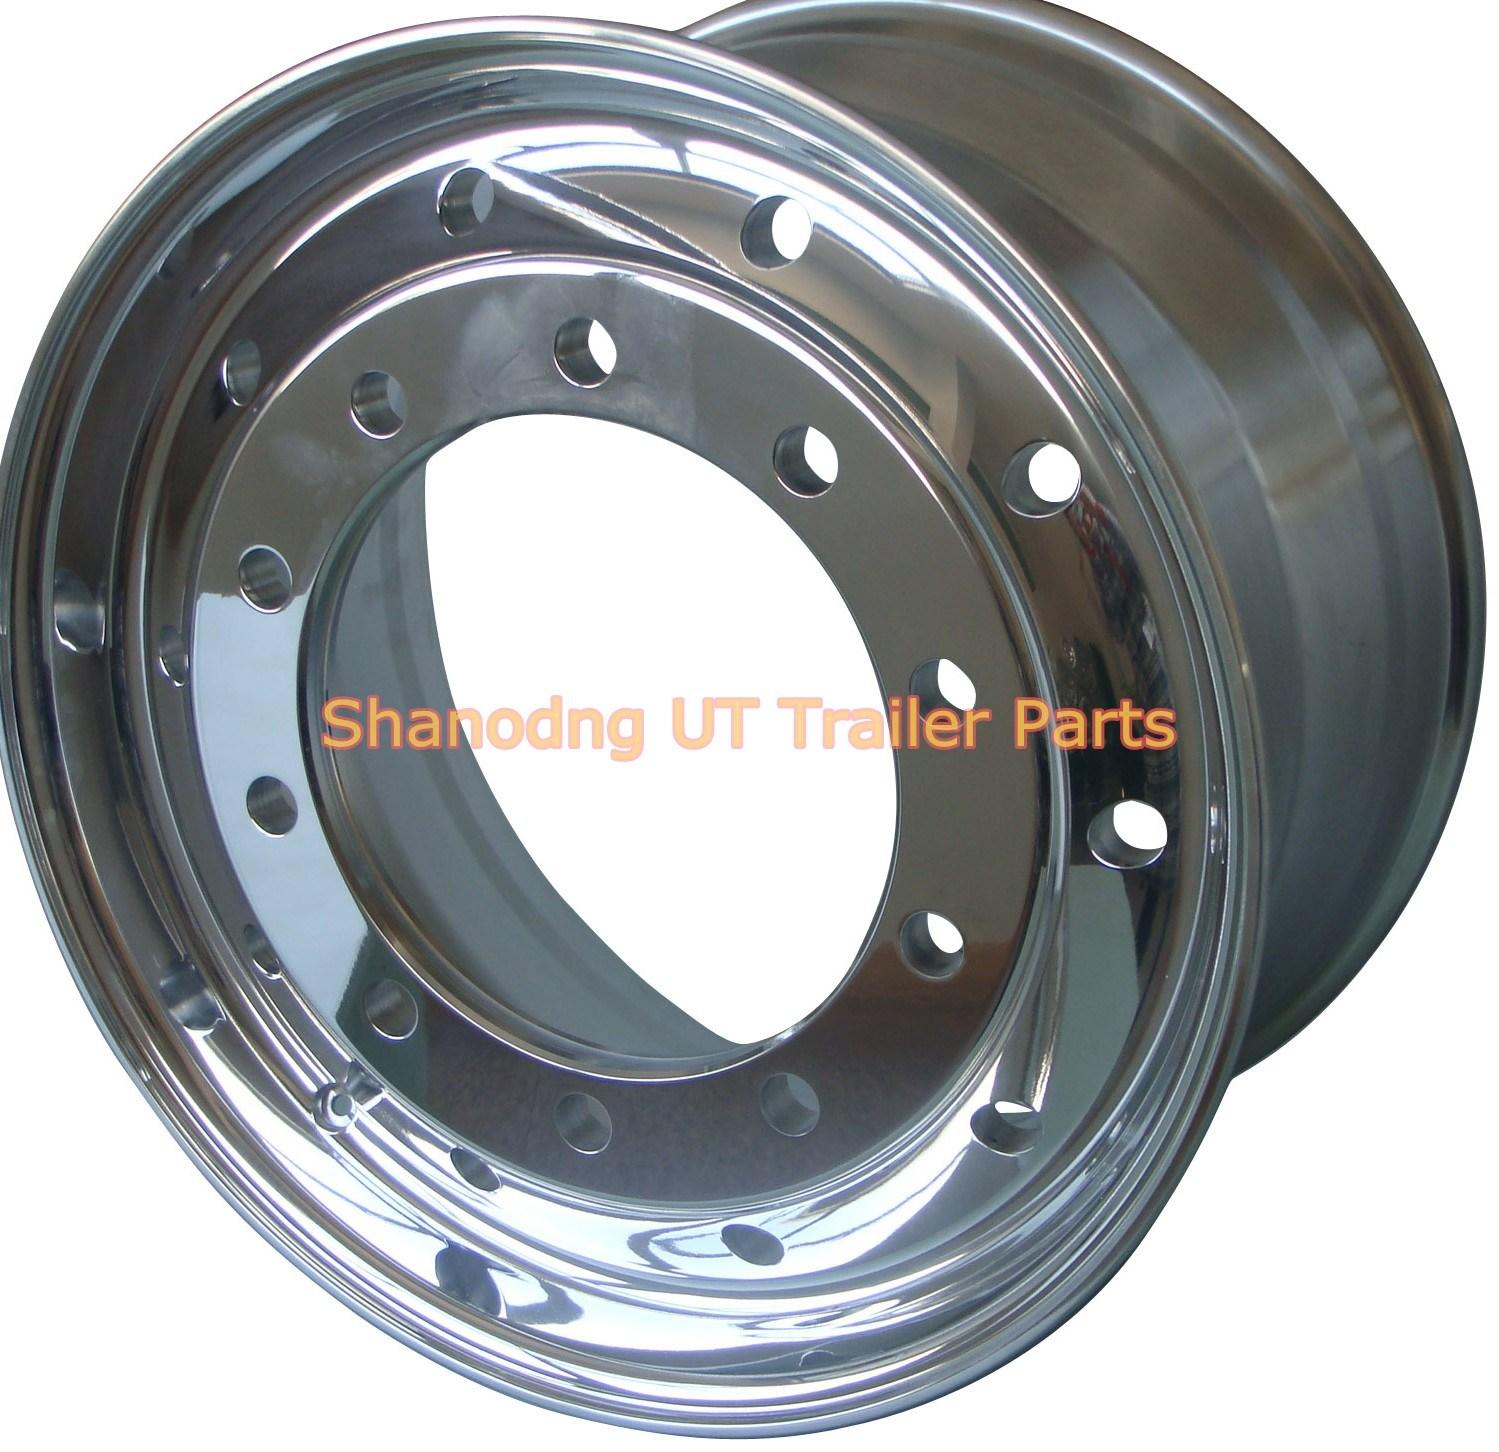 8.5X24 6.5X20 Truck Trailer Tube Wheel Rims